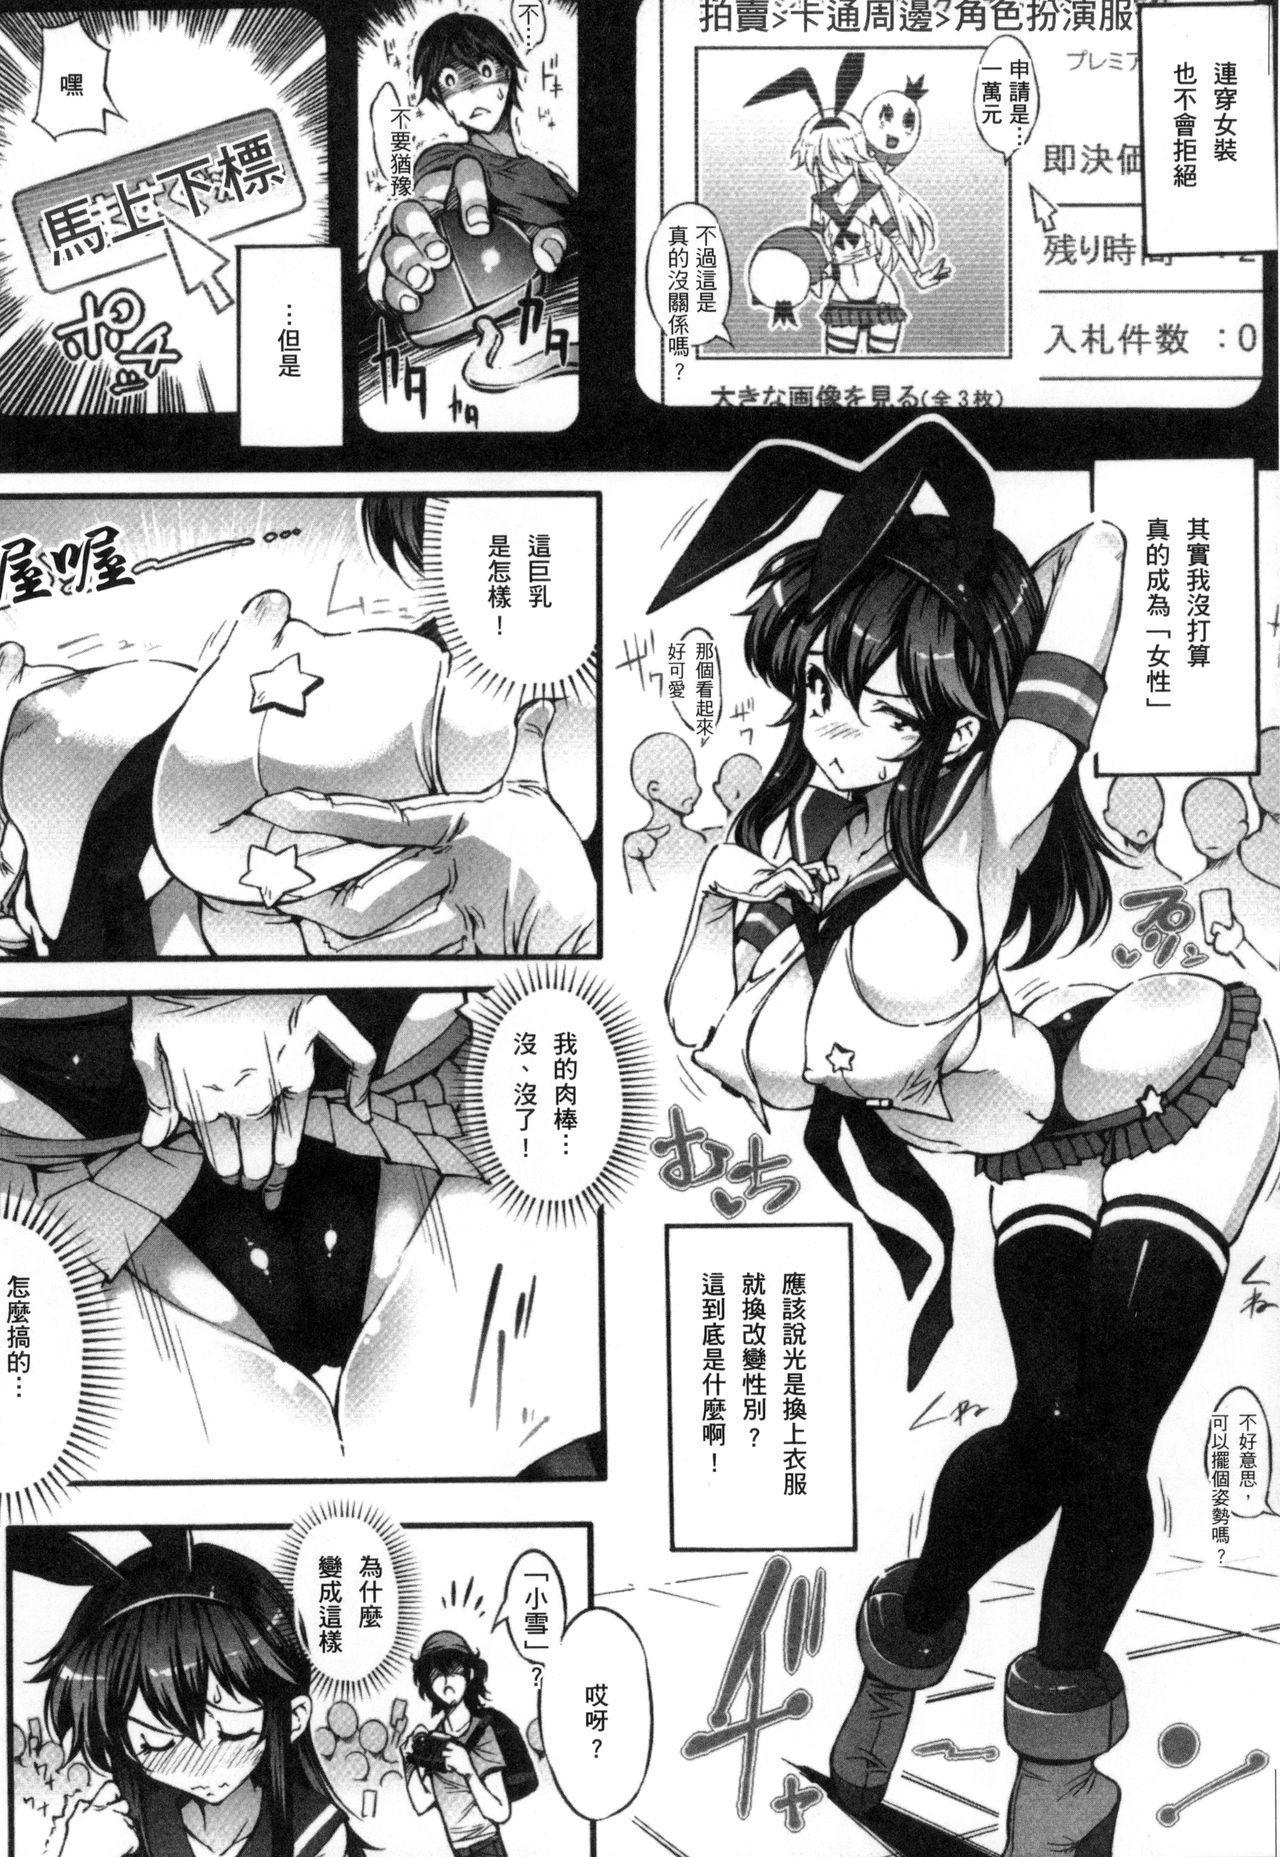 2D Comic Magazine Seitenkan Shite Haramasarete Botebara End! | 性轉換與懷孕,滿腹精液收場! 126